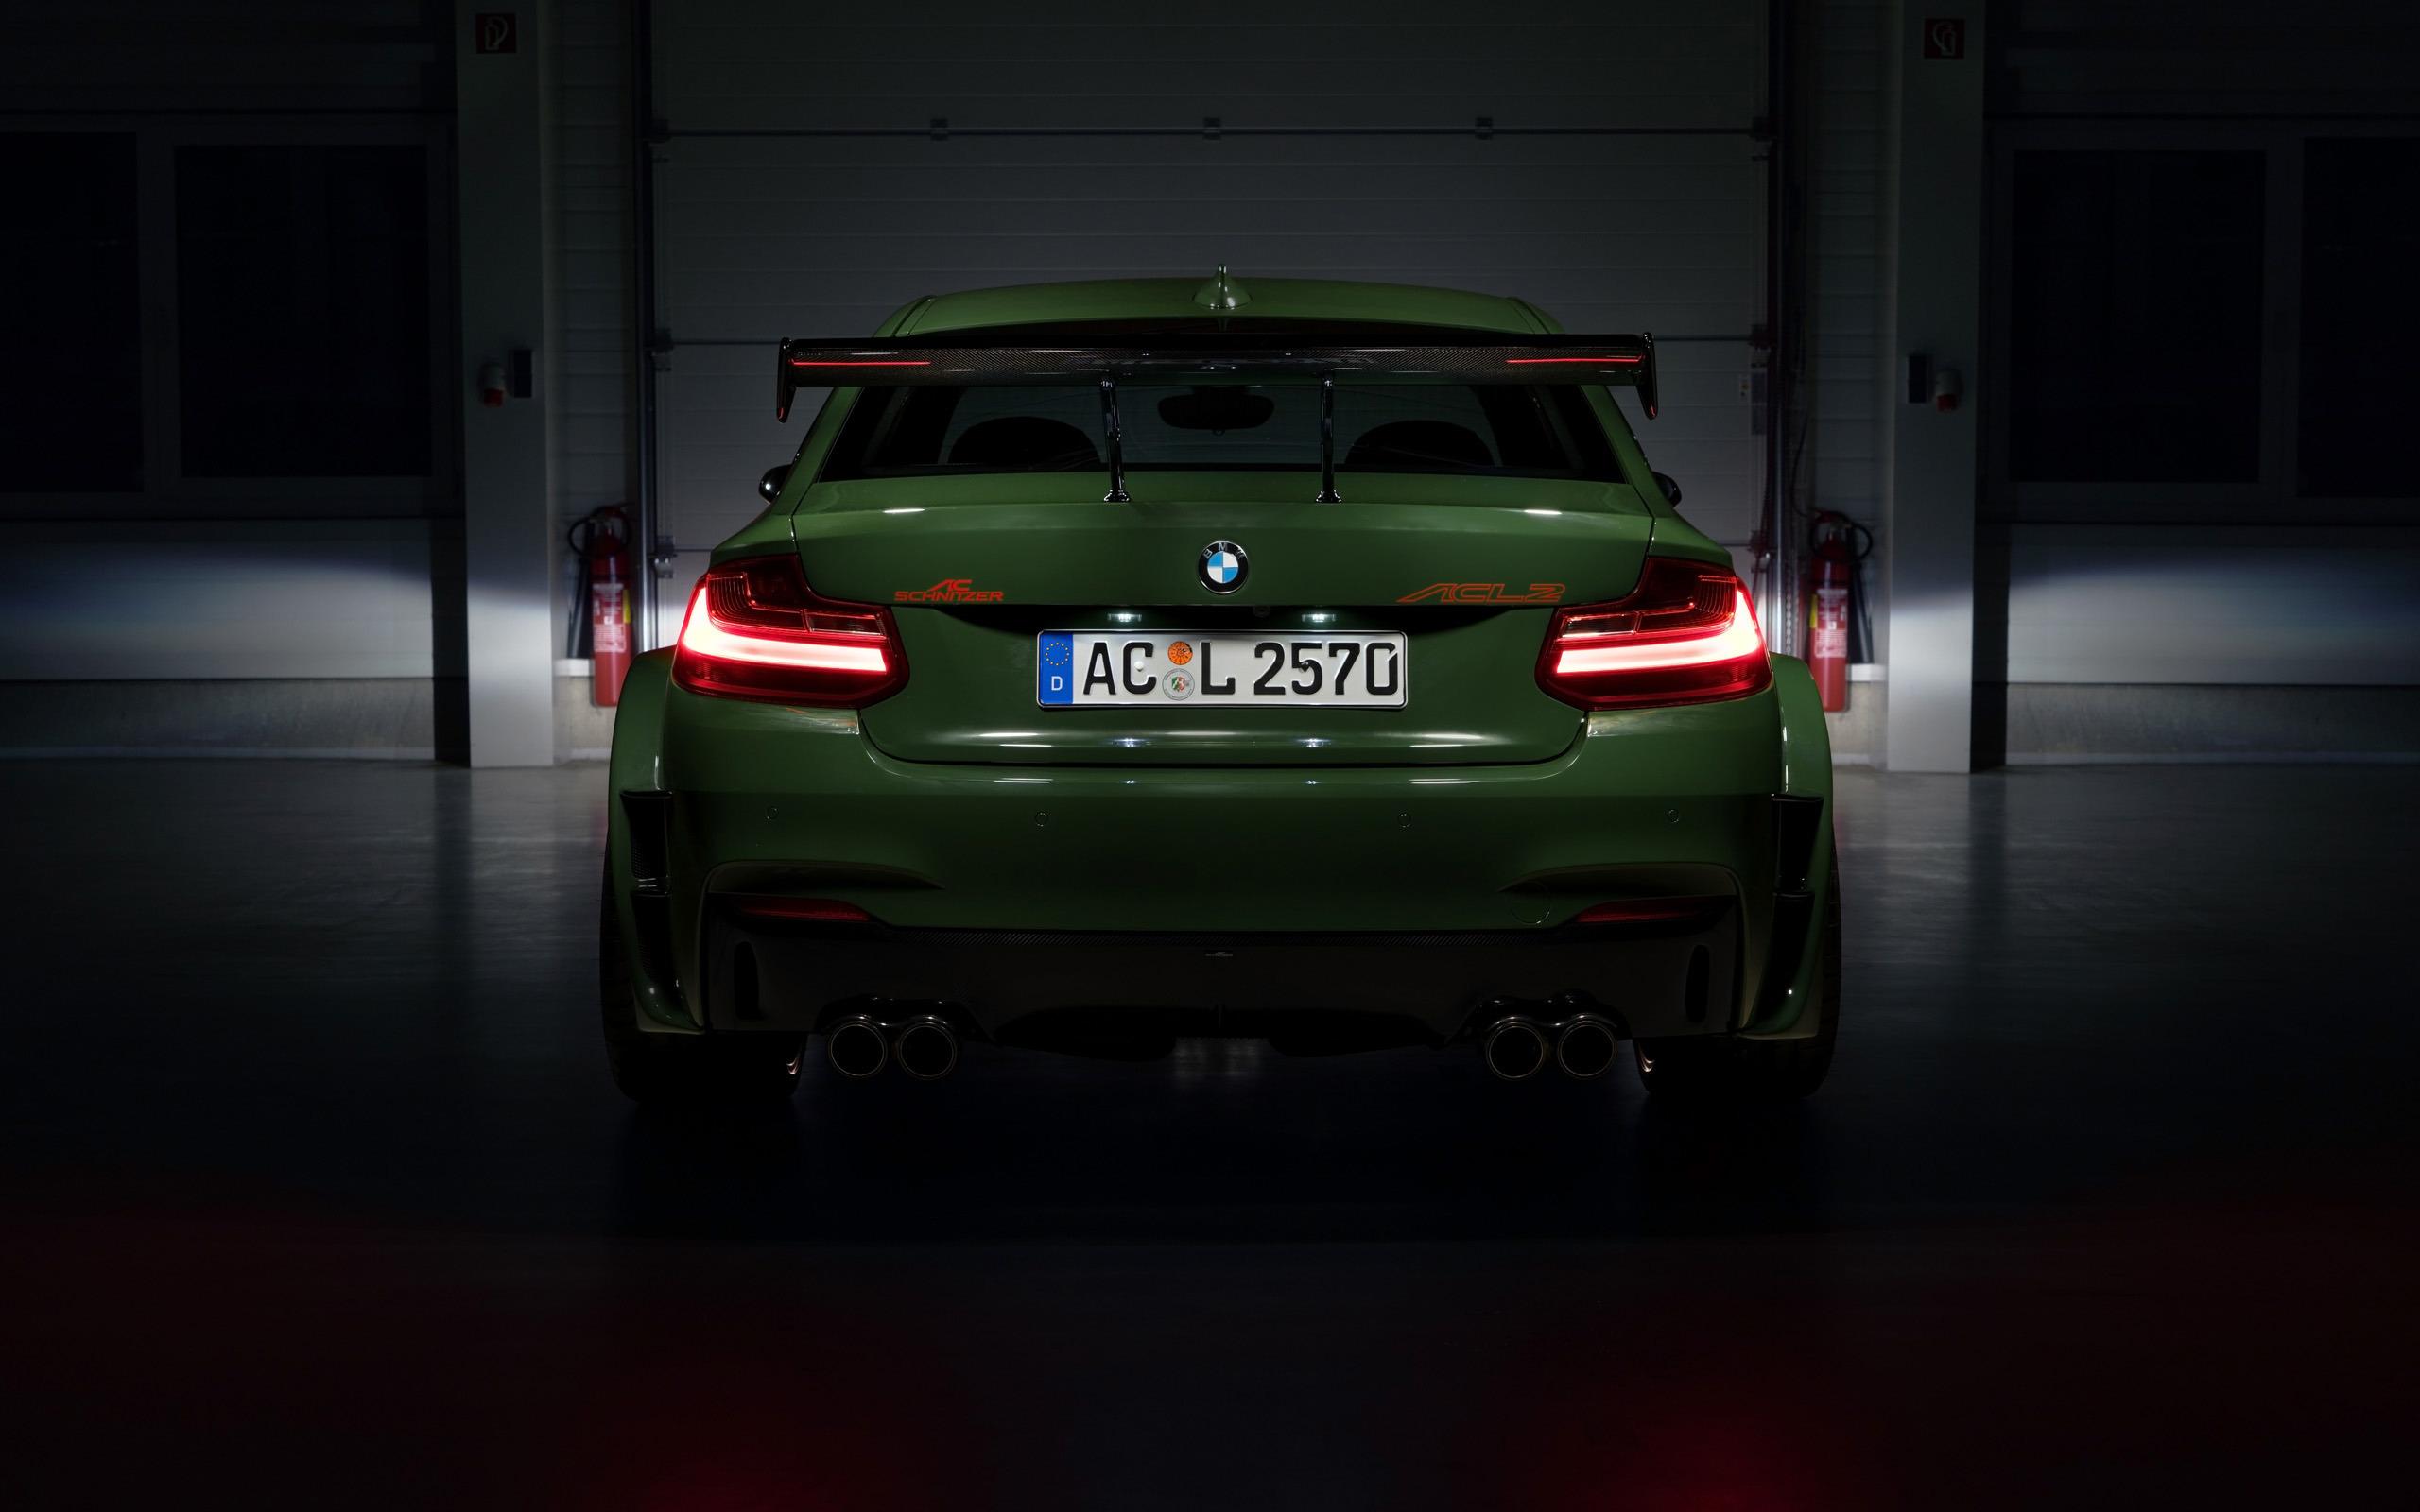 AC Schnitzer BMW M 235i ACL2